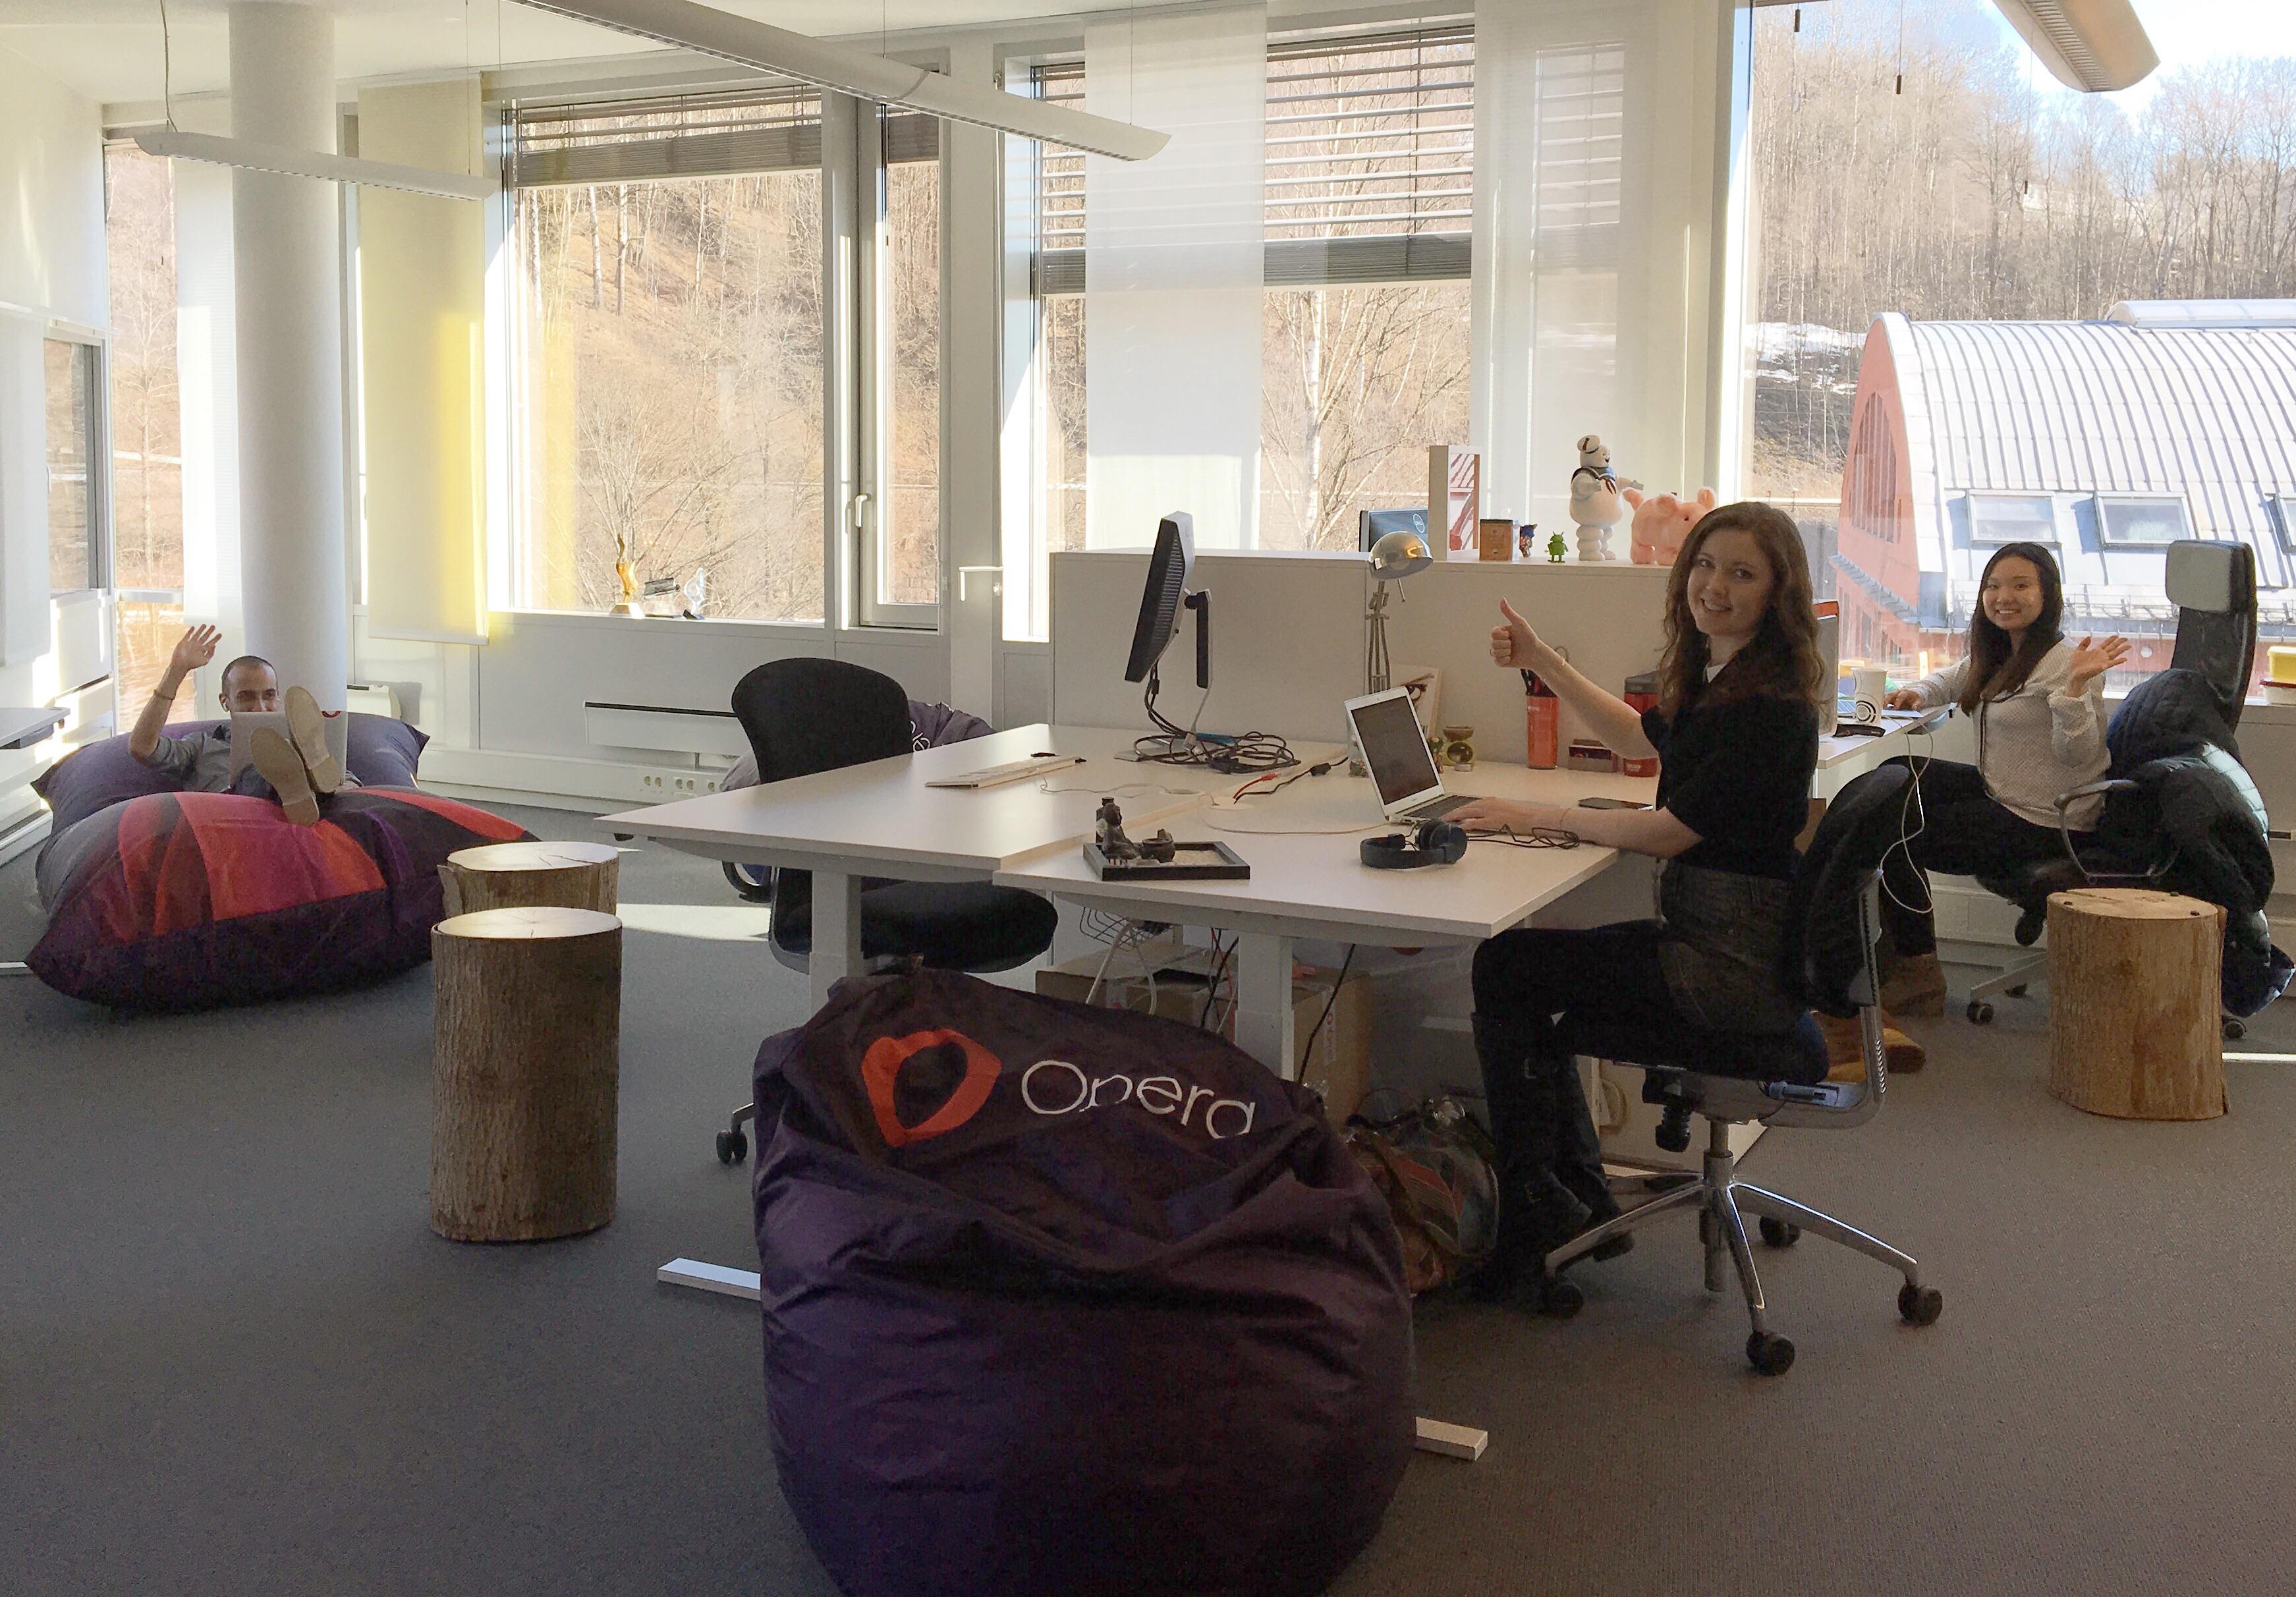 Opera software browser team social media customer service Oslo office Ruth Angela